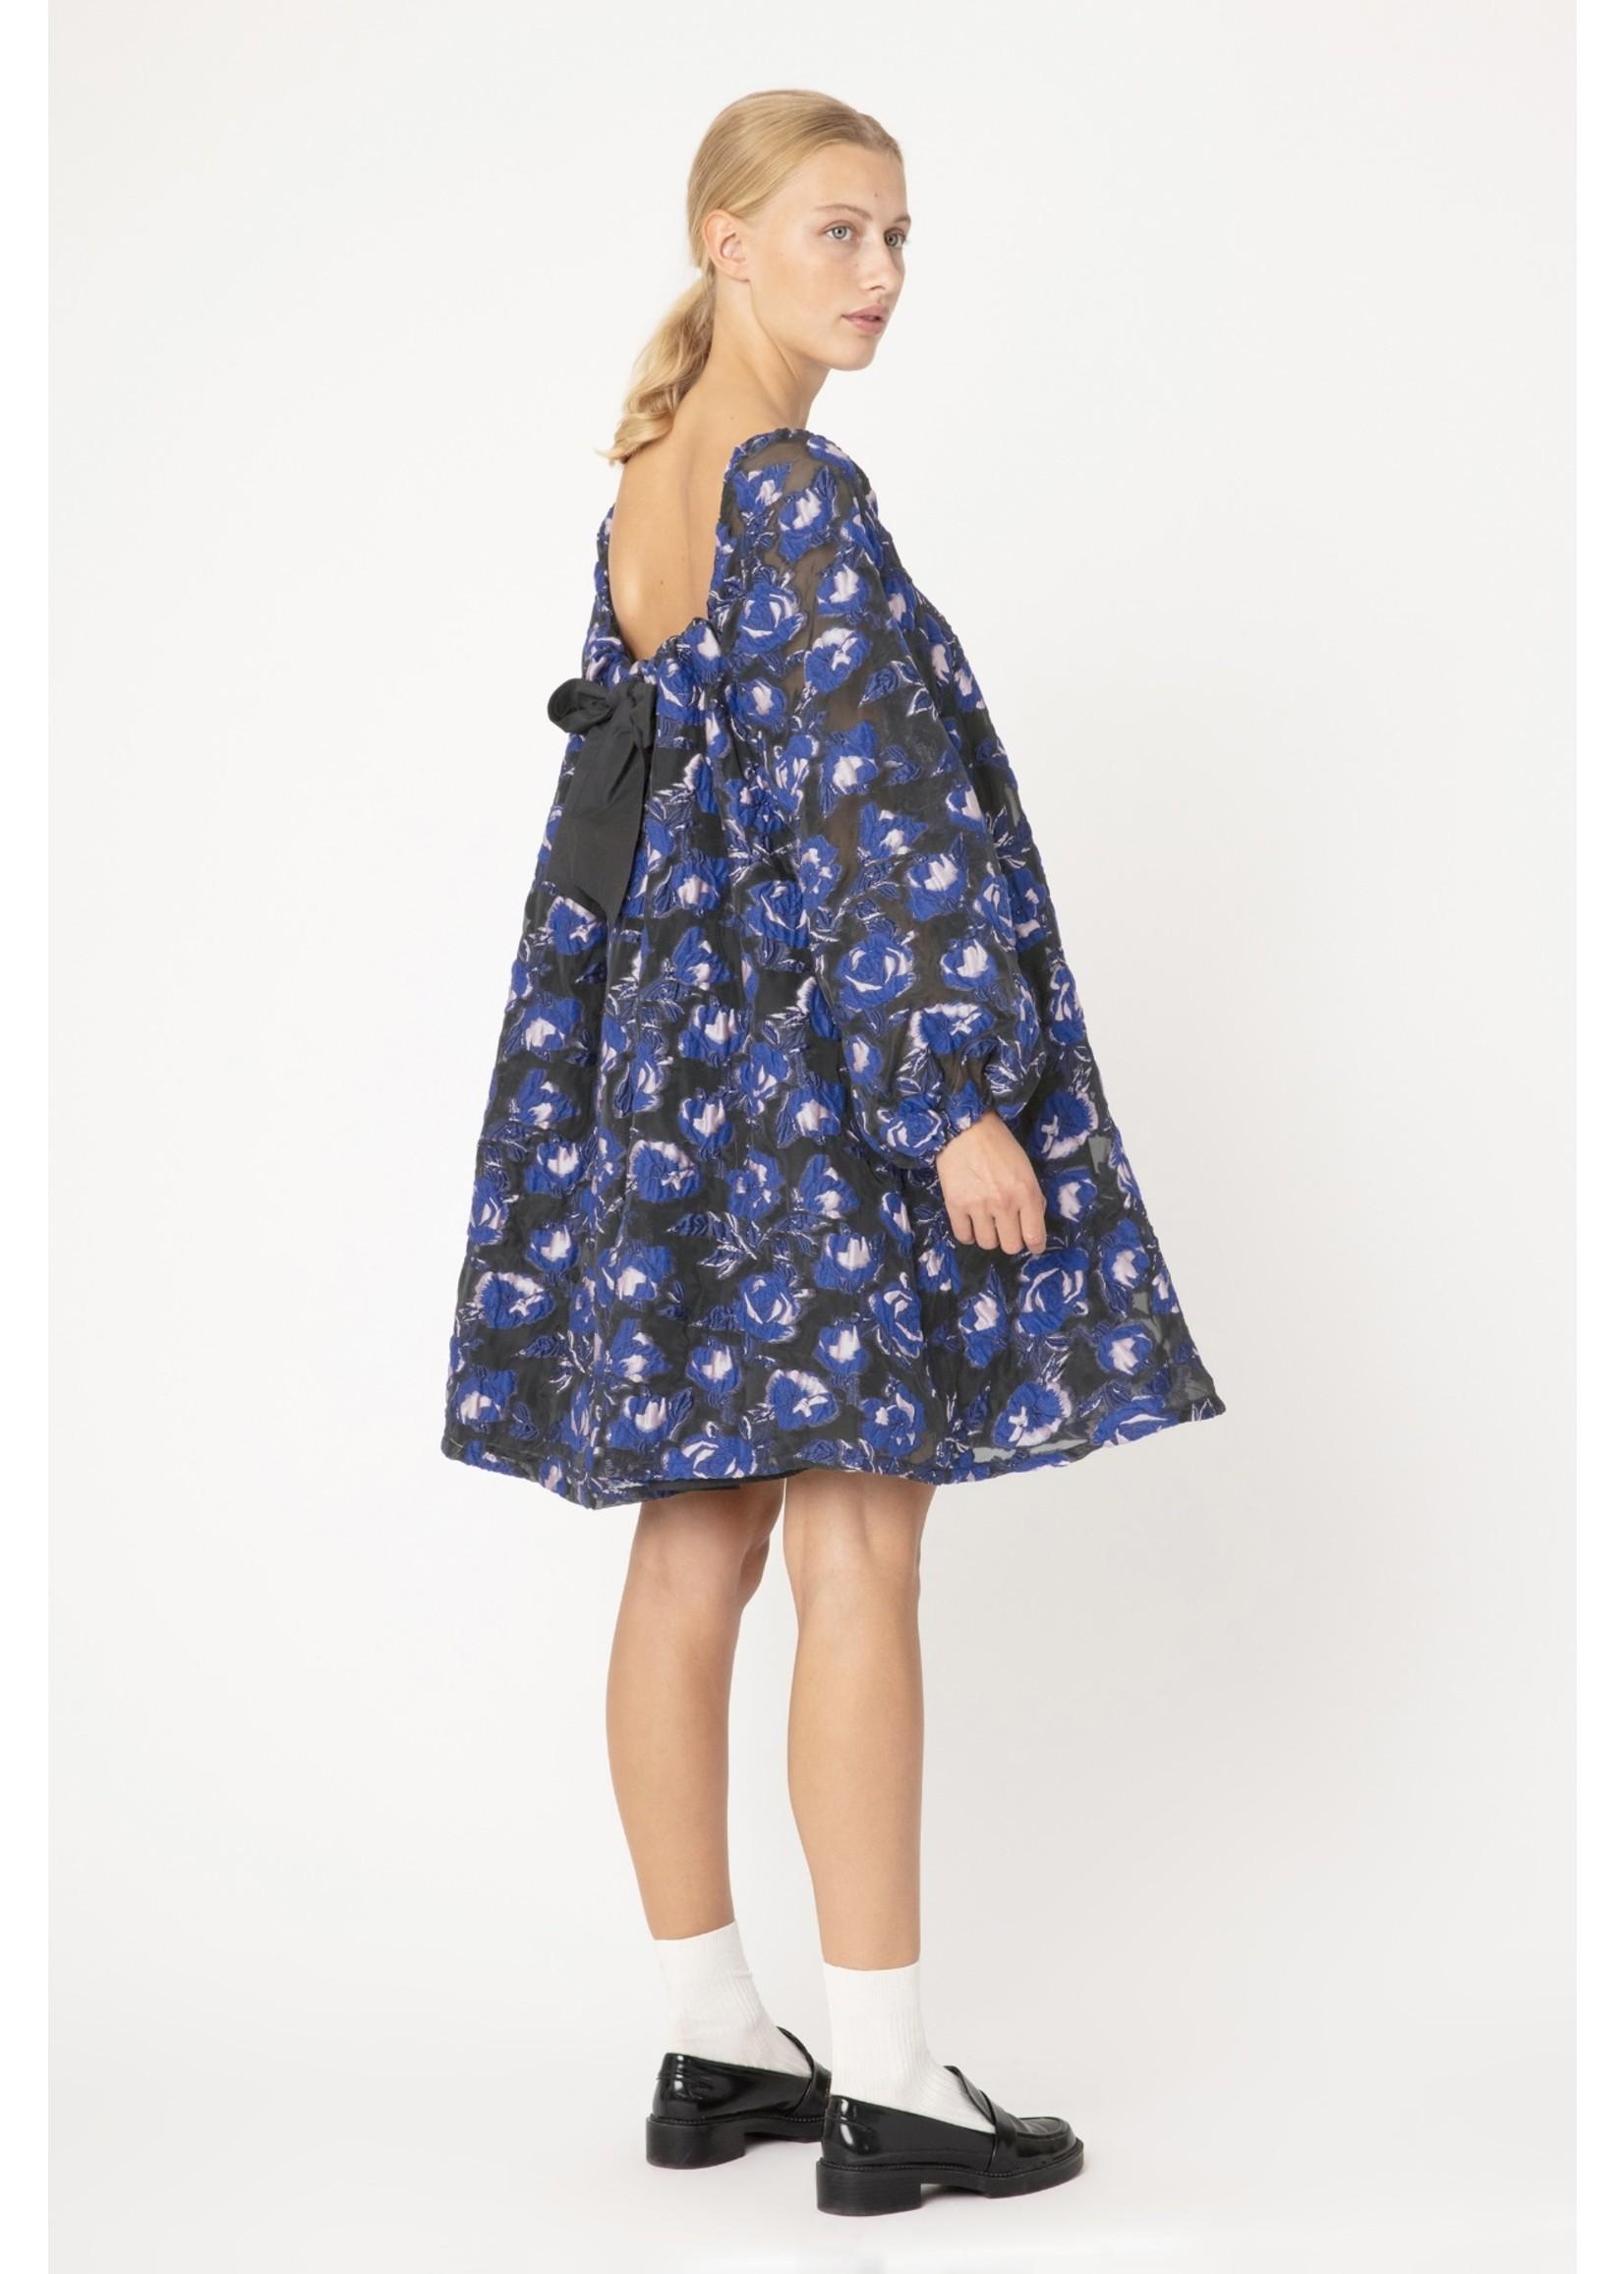 BOW DRESS ELECTRIC BLUE